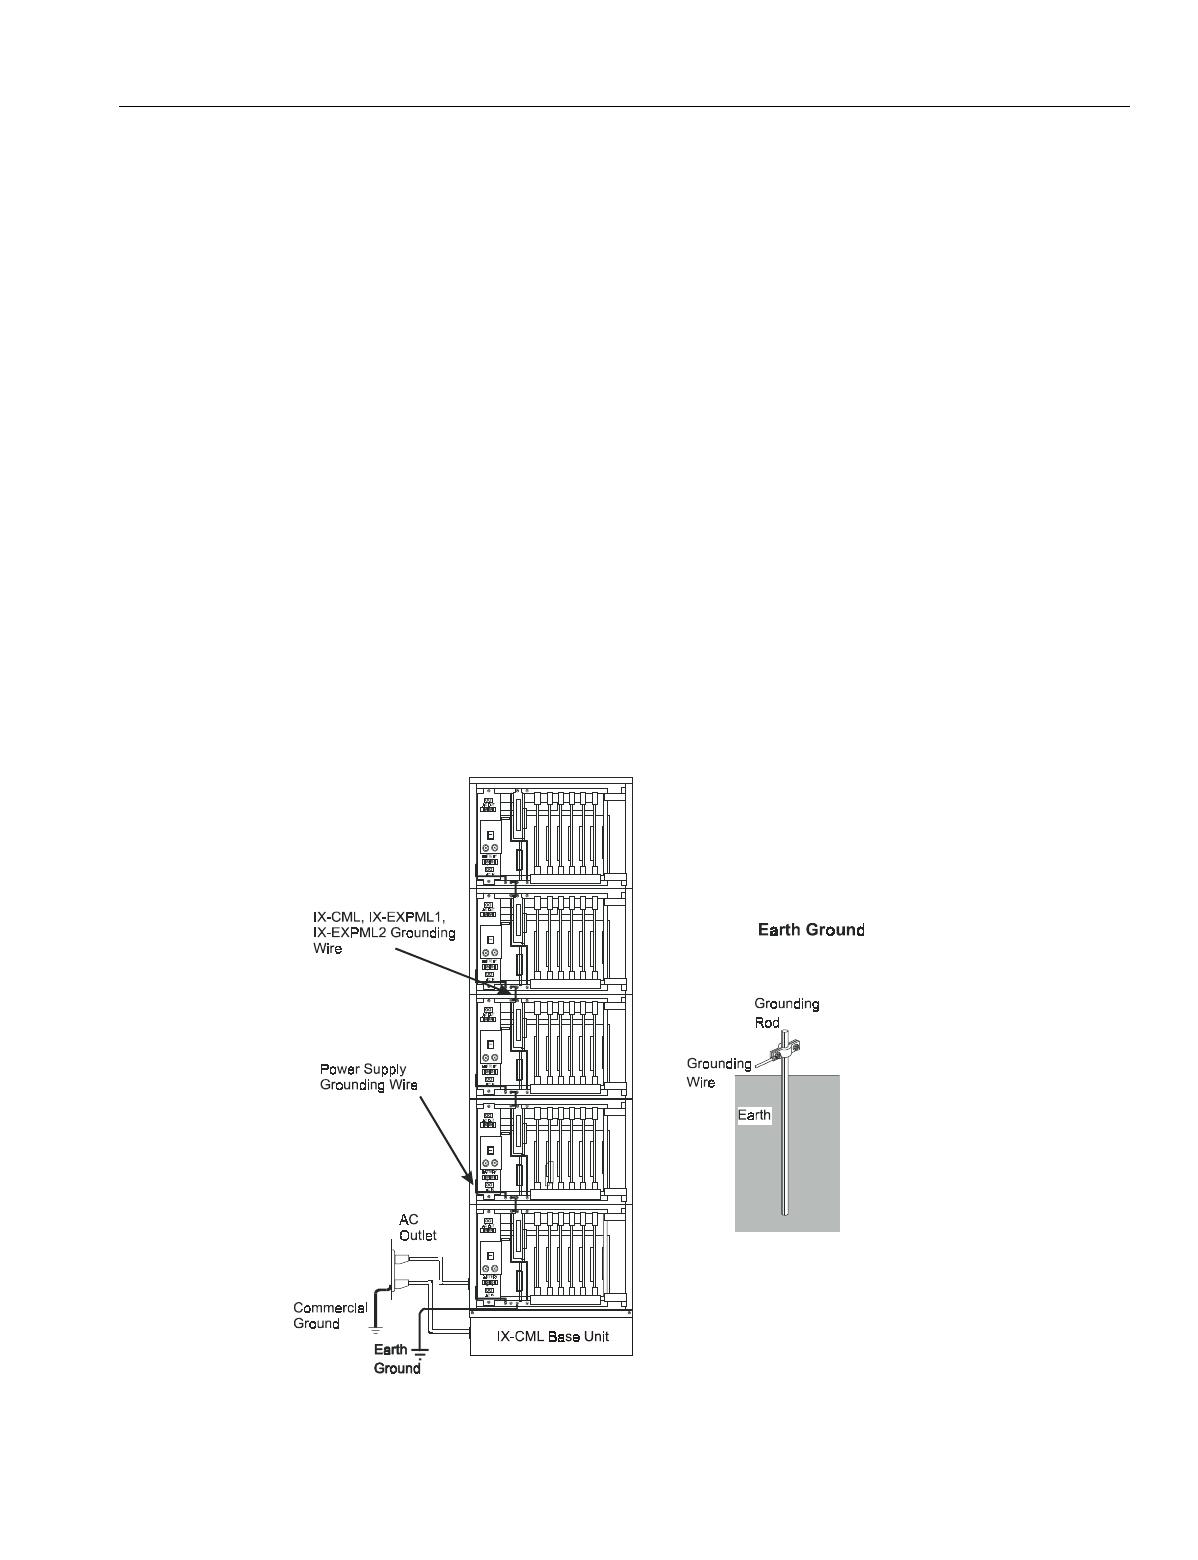 Iwatsu America Adix Bs Upcs Base Station User Manual Eba 2000 28 Sw F8 Arctic Cat Wiring Diagram Free Download Schematic Wire En